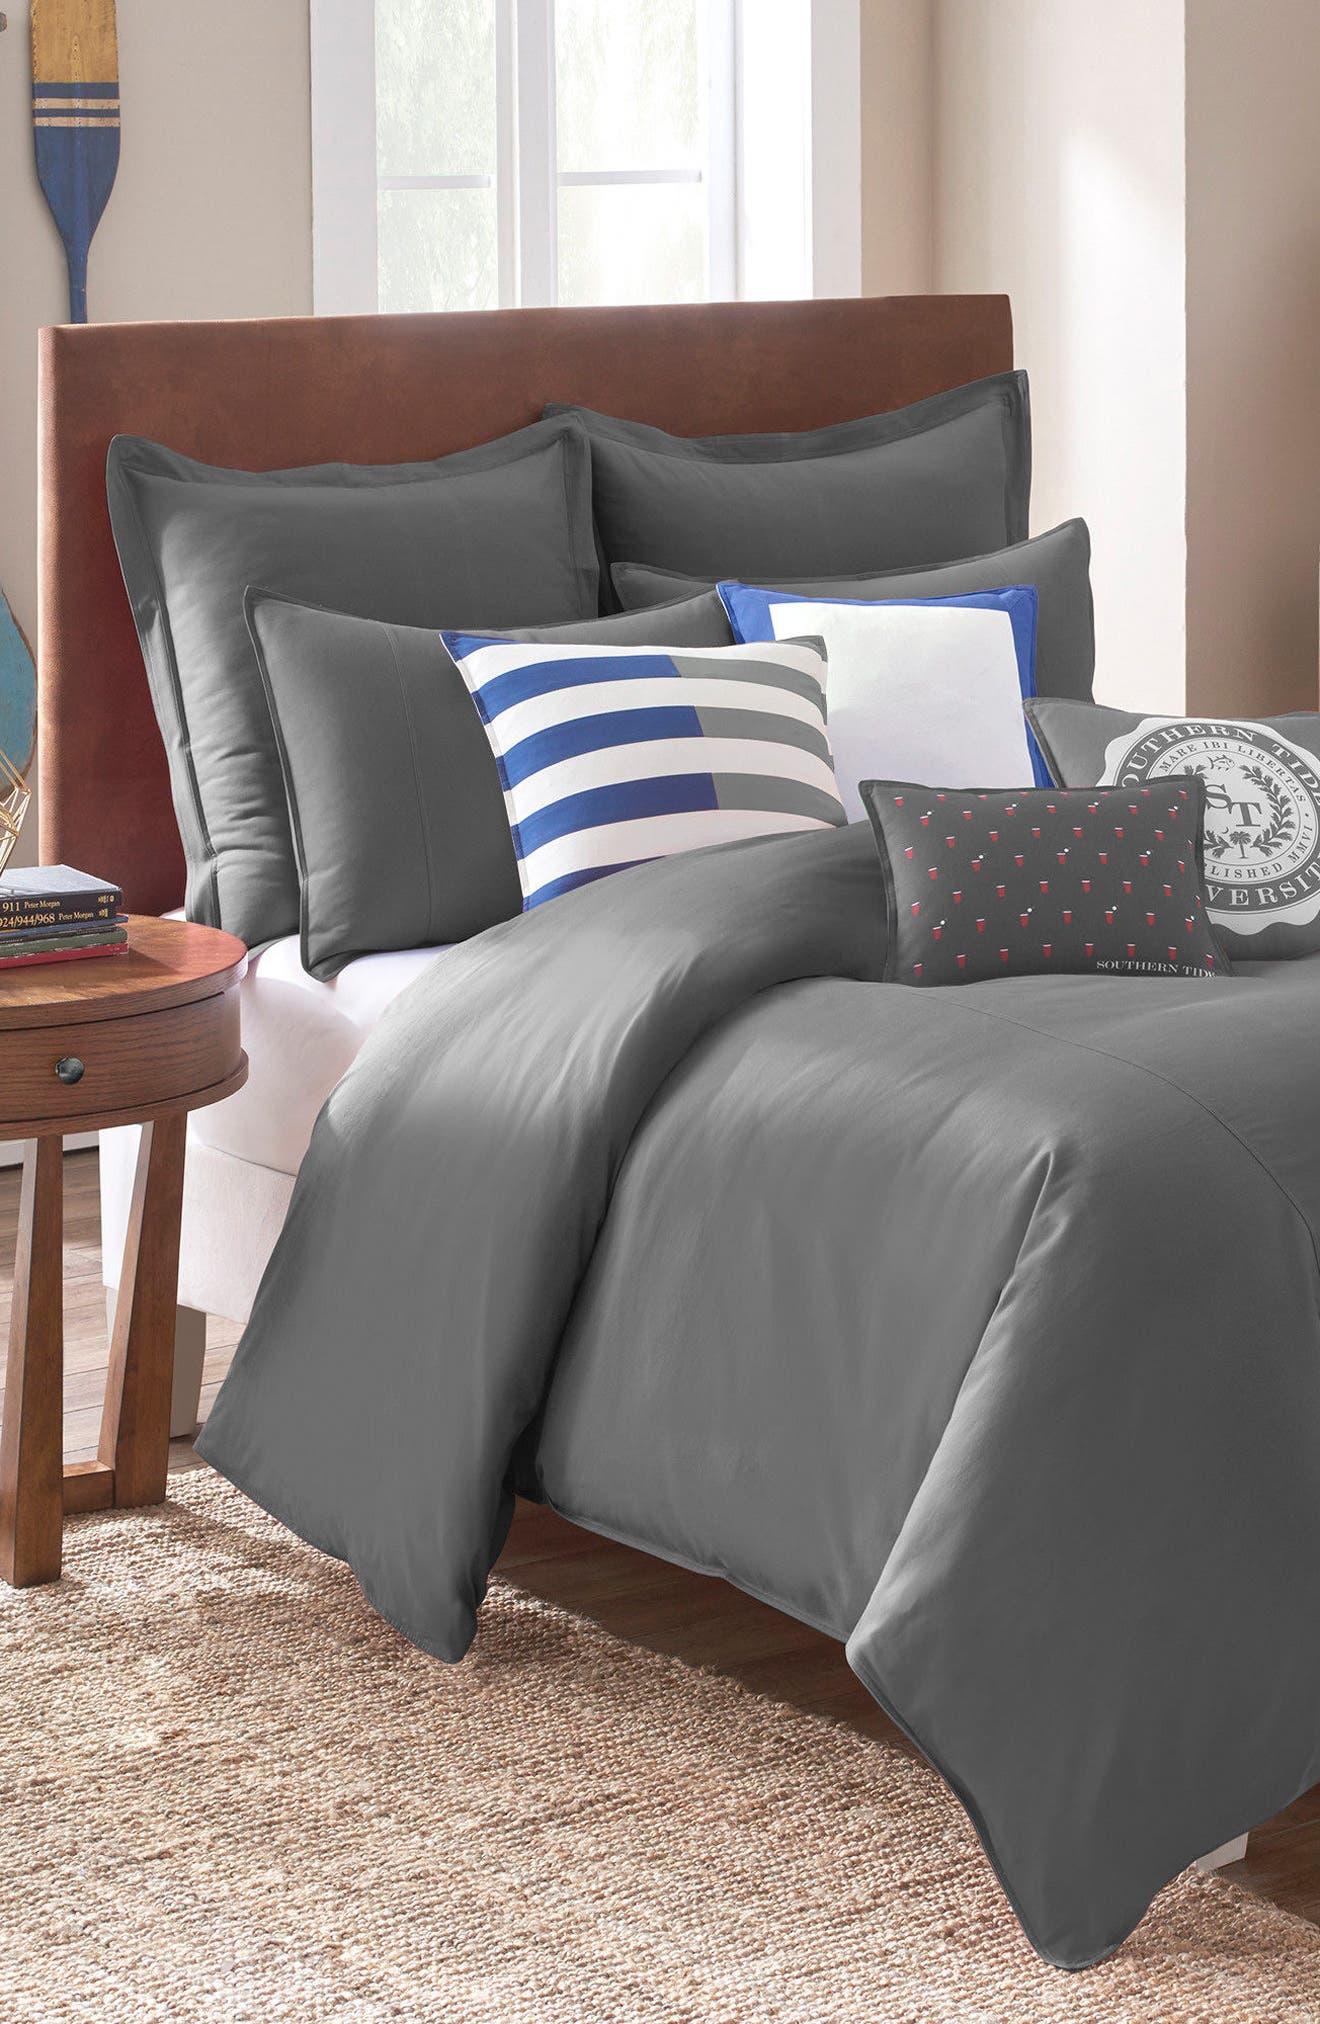 Skipjack Chino Comforter,                         Main,                         color, 020